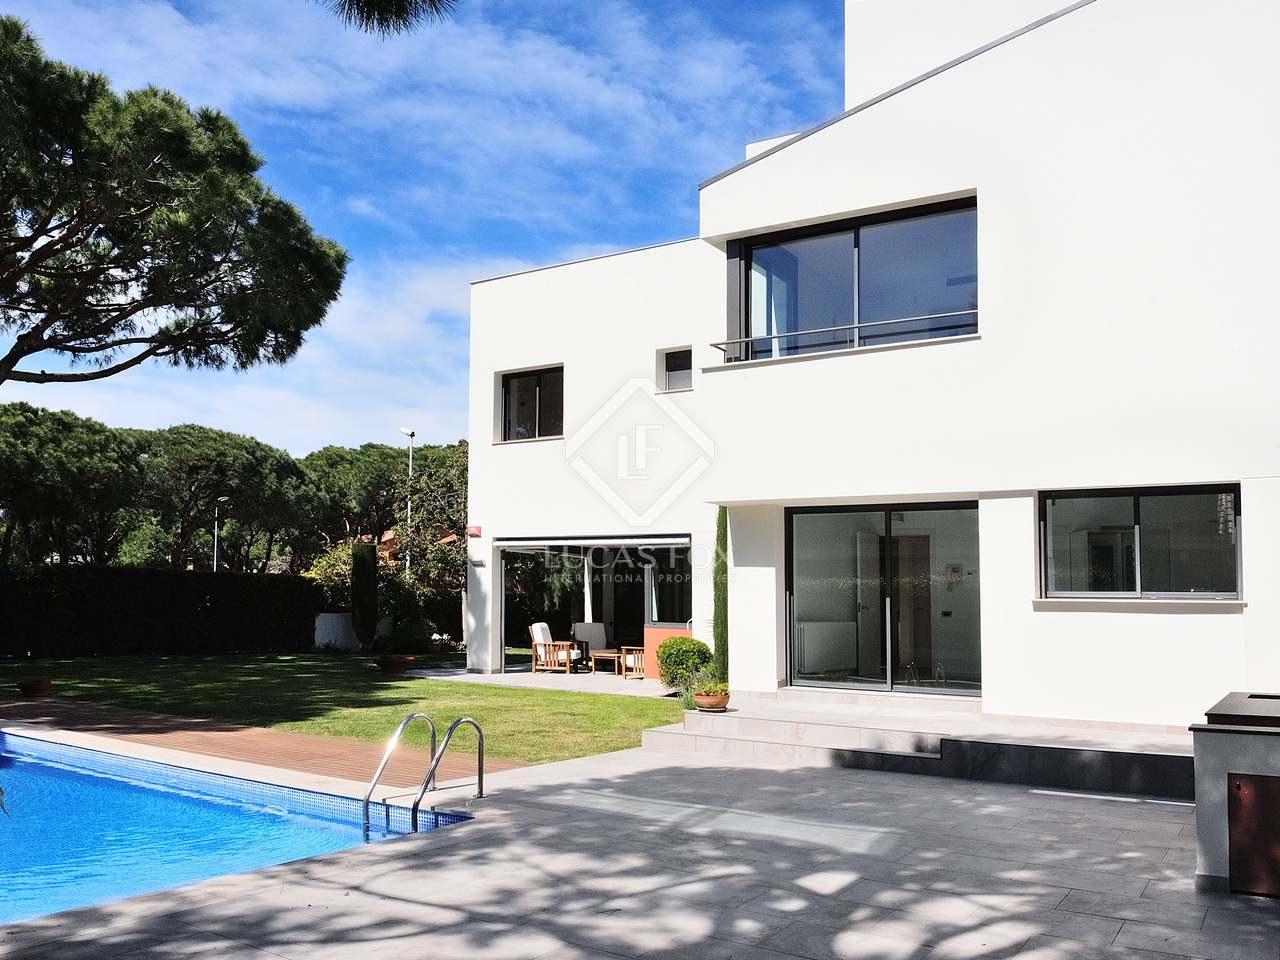 Casa de 662 m con 500 m de jard n en venta en gav mar for Piscina gava